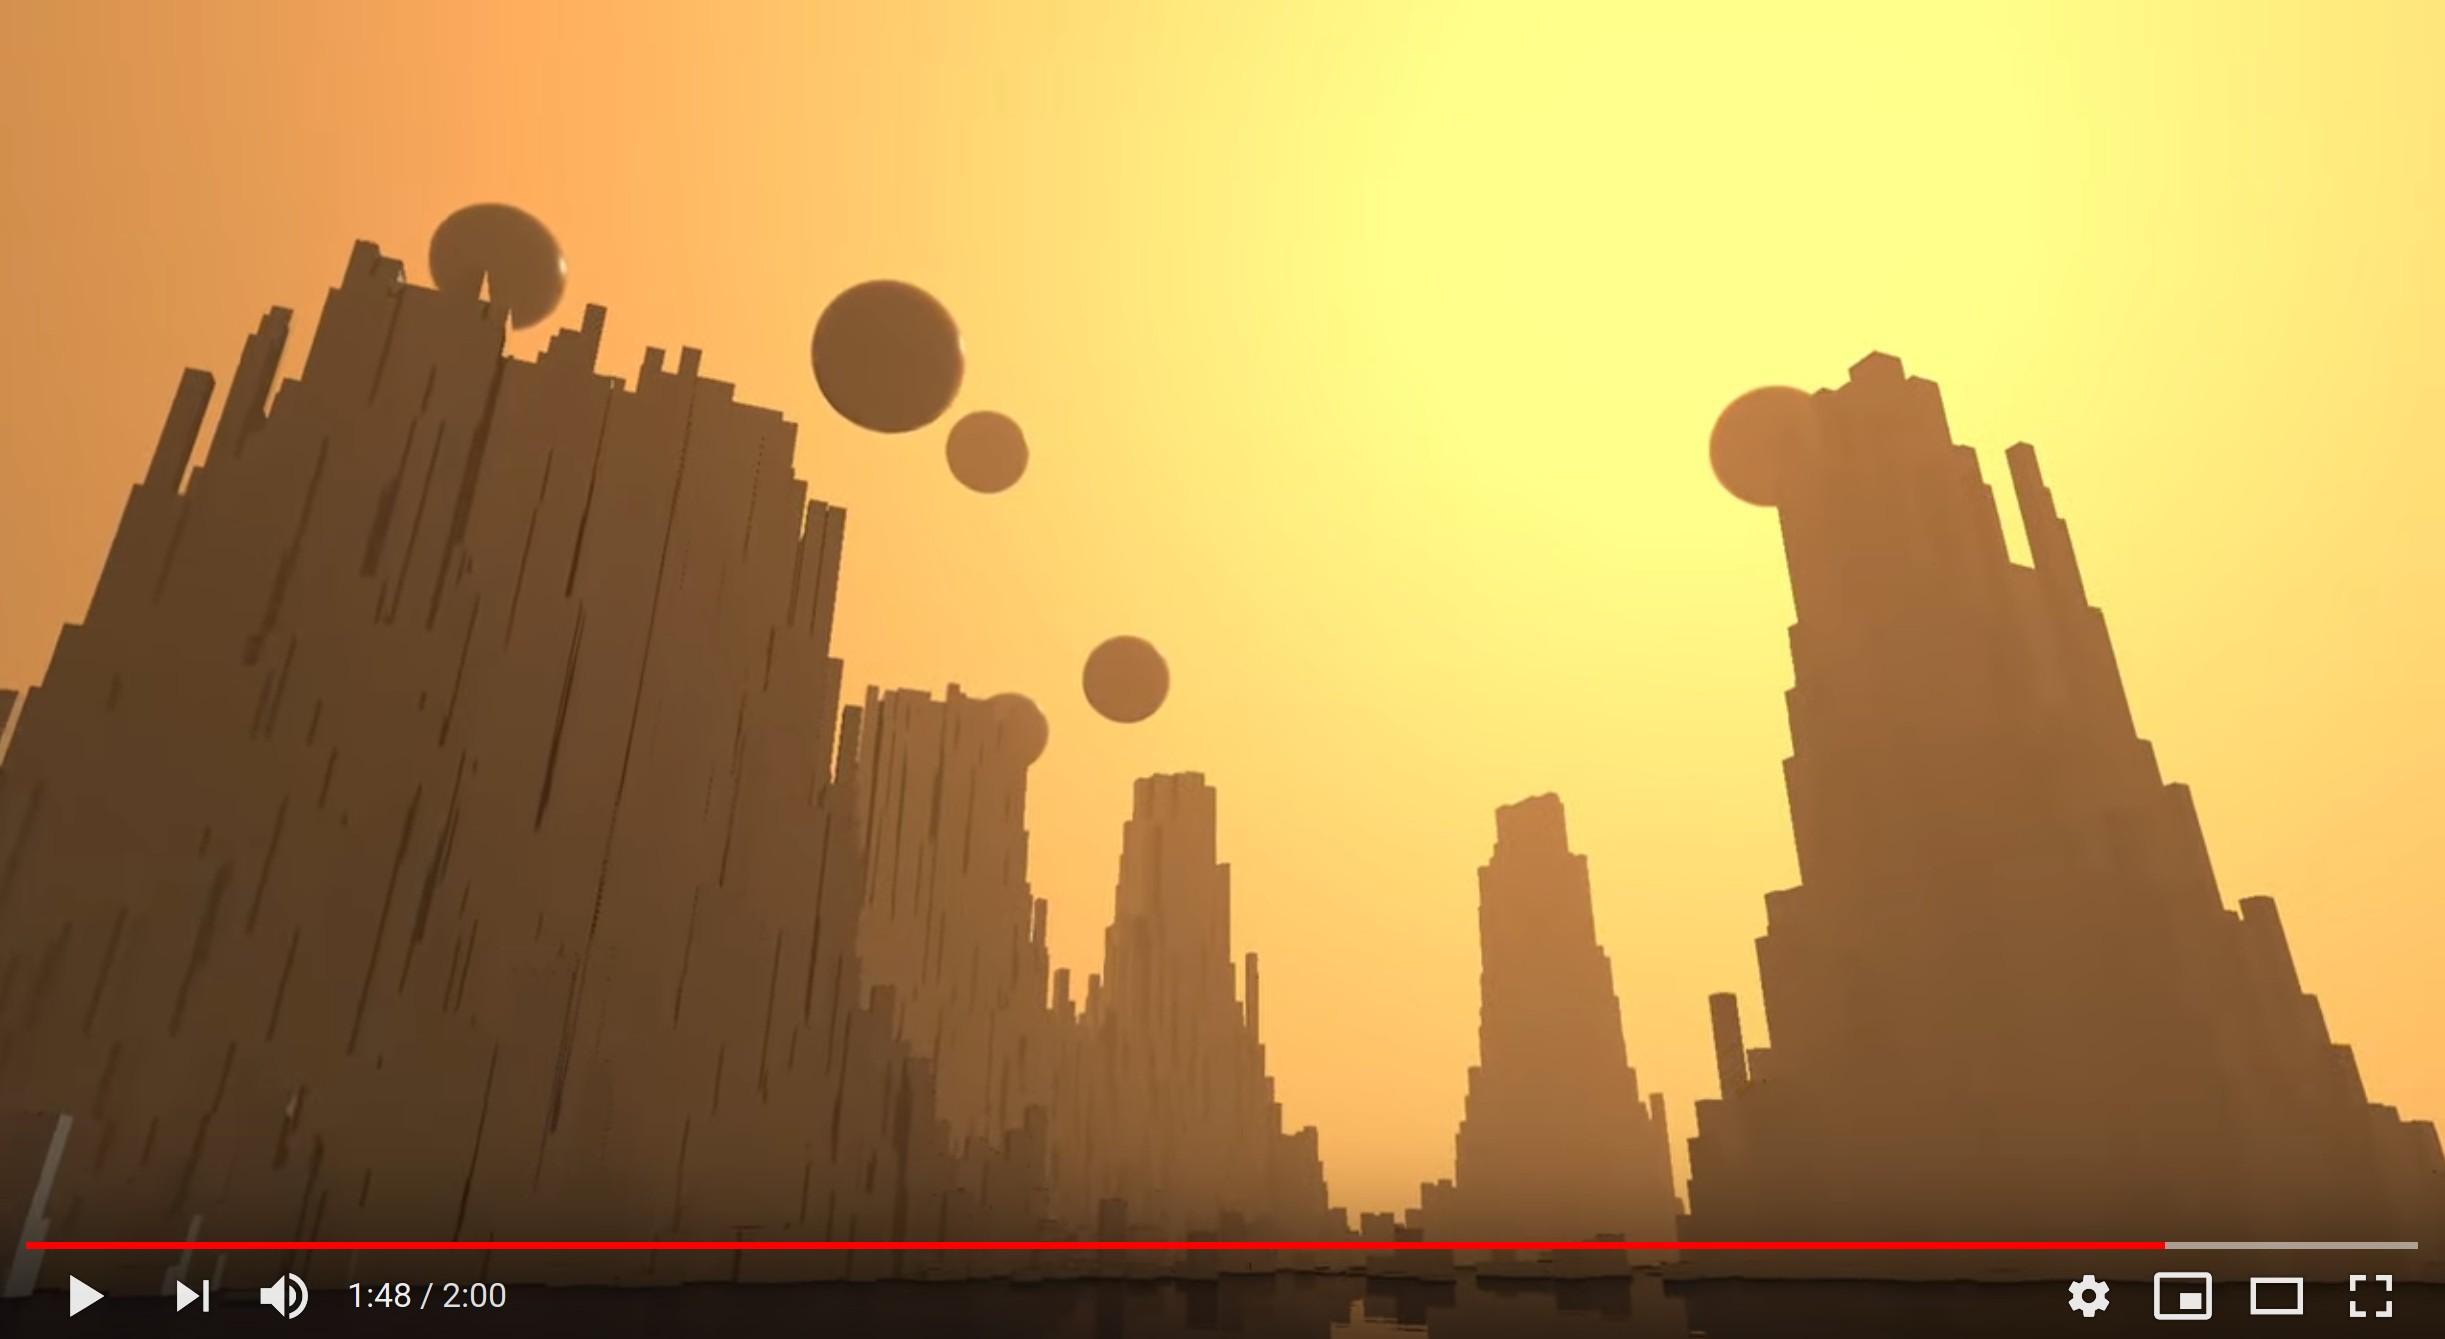 Youtube preview: mountains & spheres